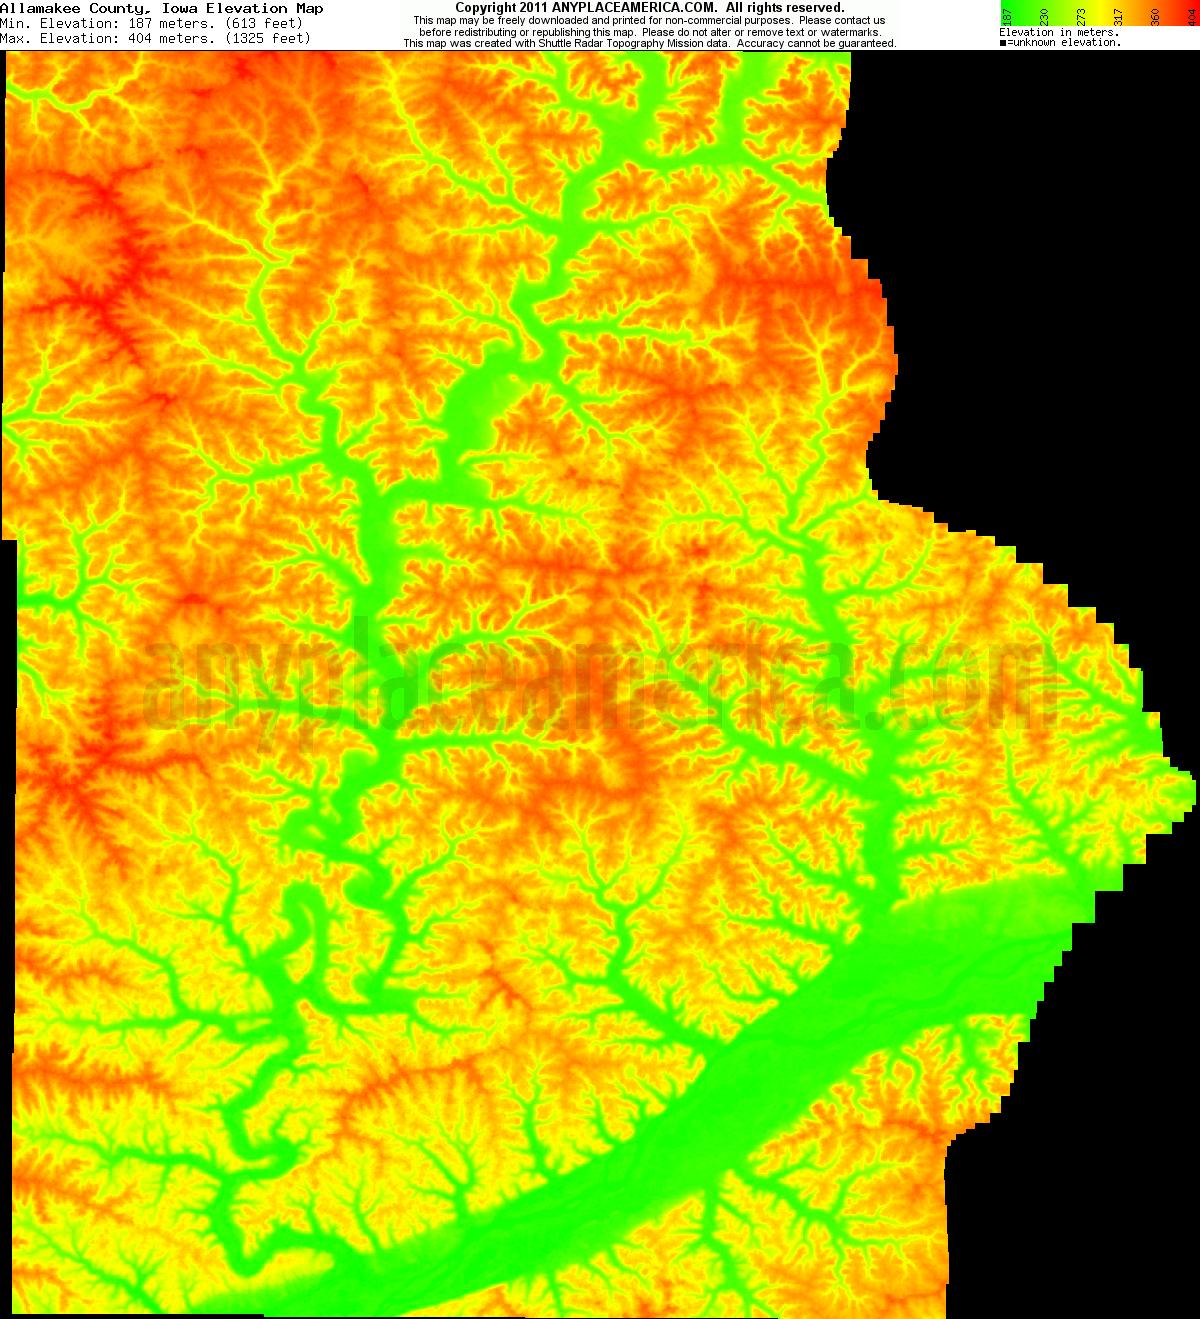 free allamakee county iowa topo maps elevations free allamakee county iowa topo maps